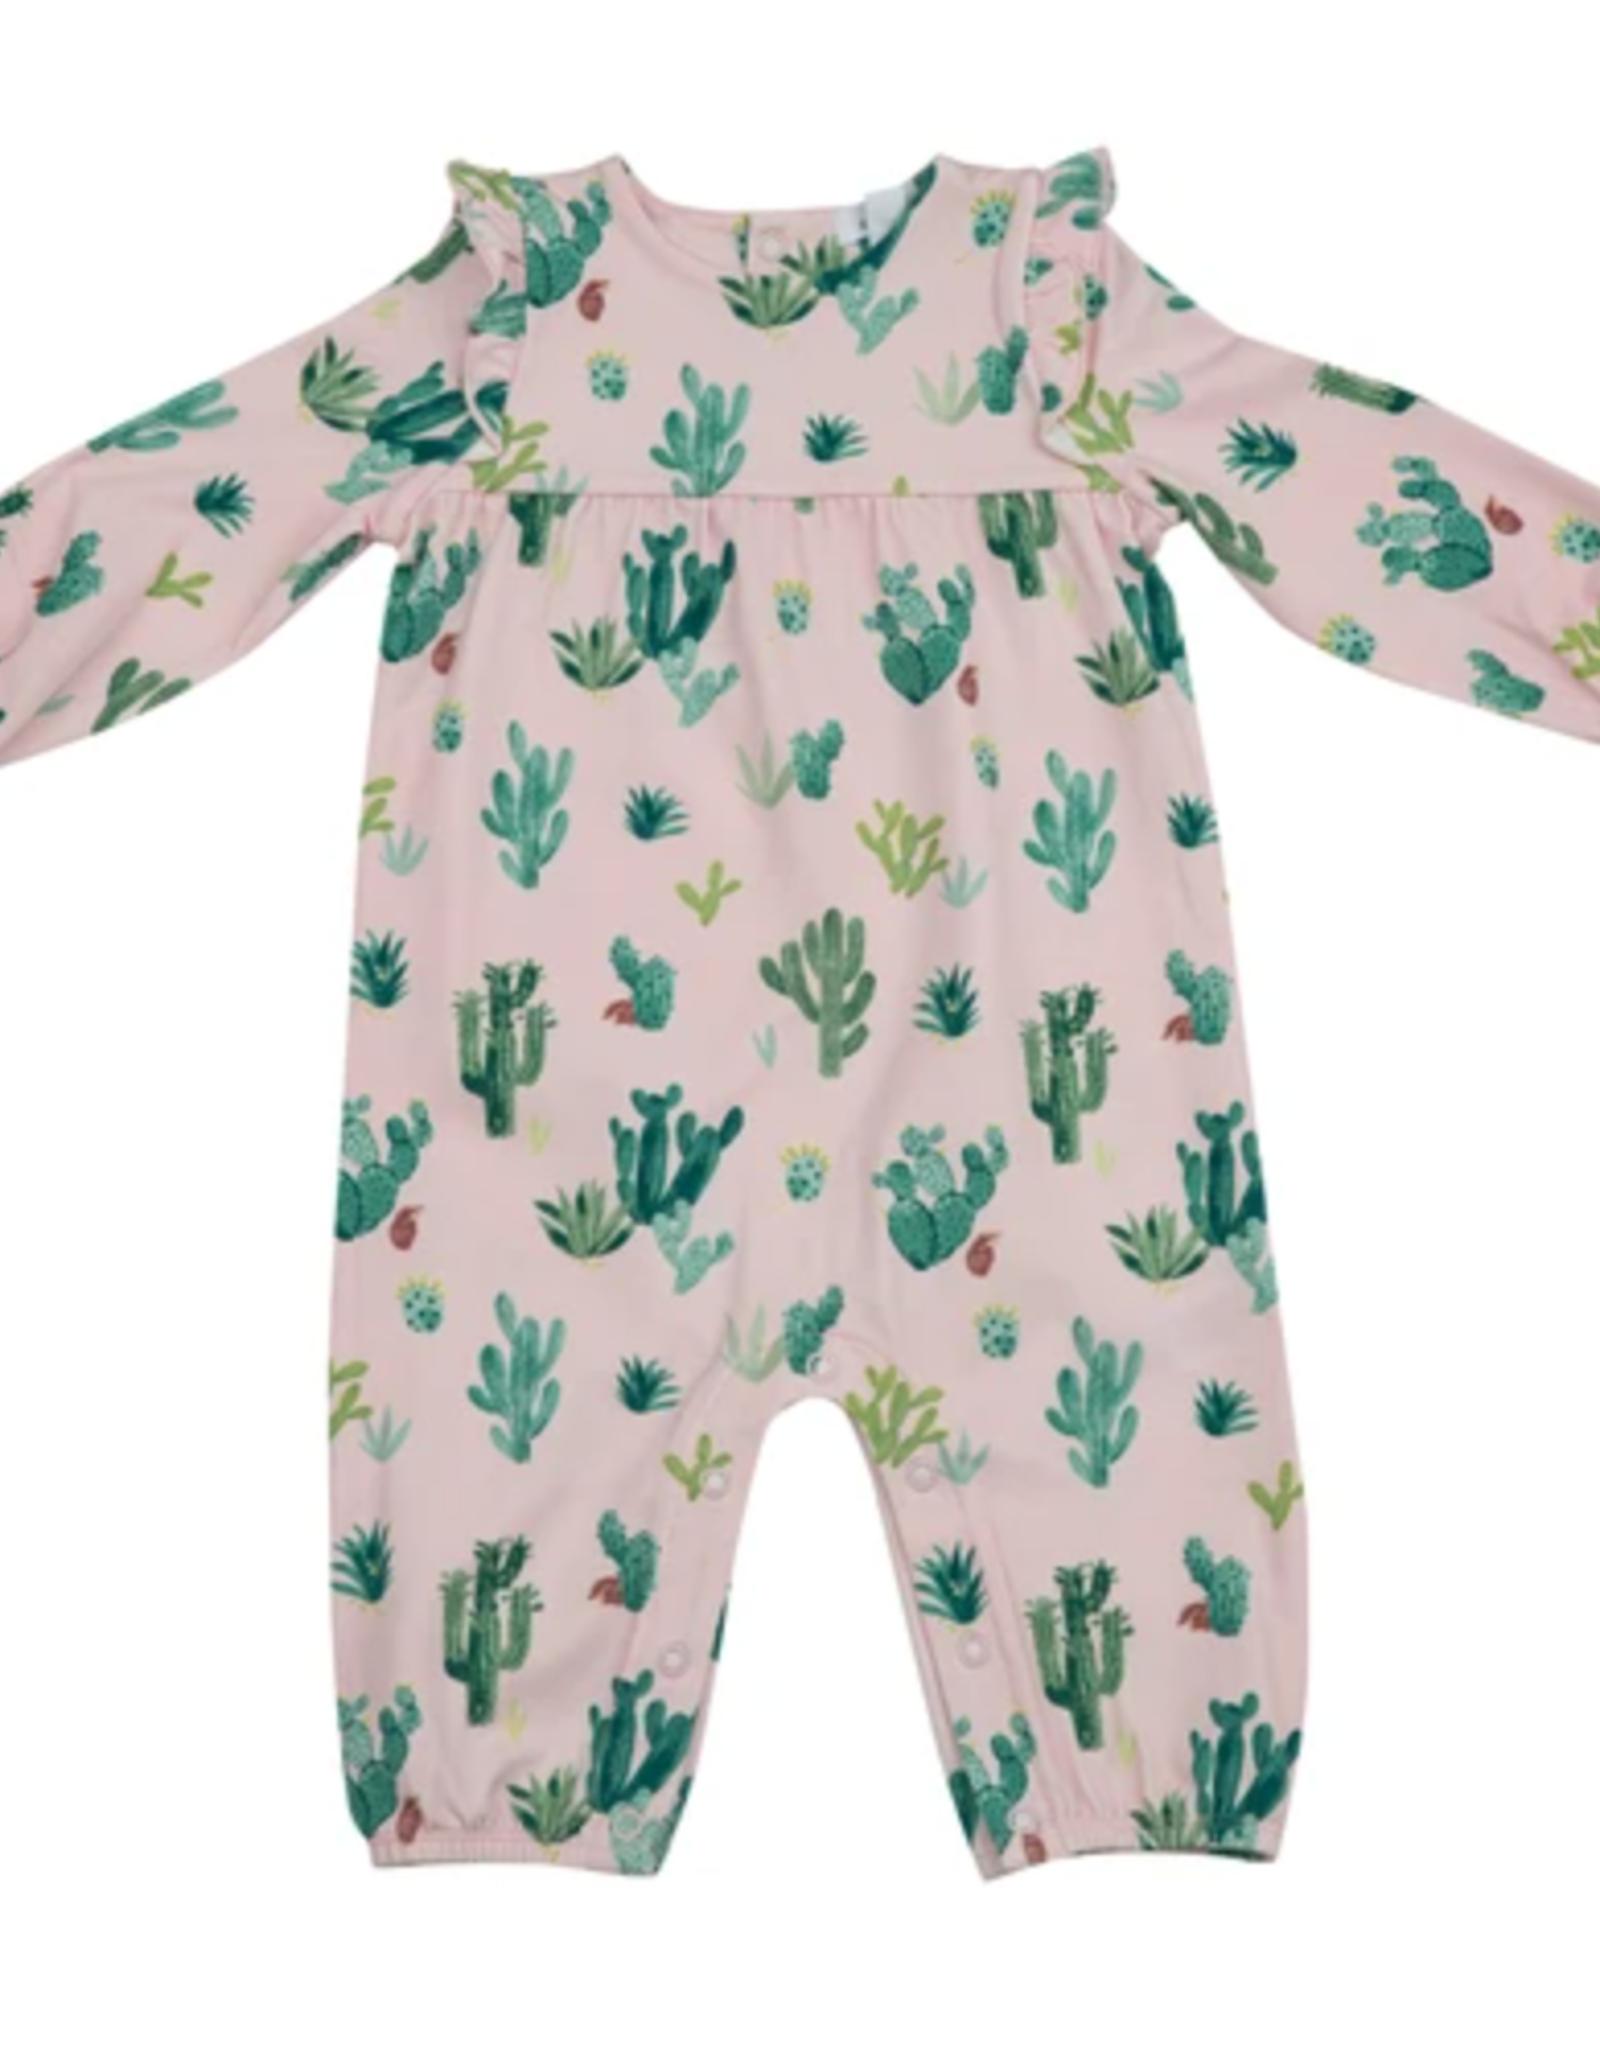 Cactus Ruffle Sleeve Romper 6-12M